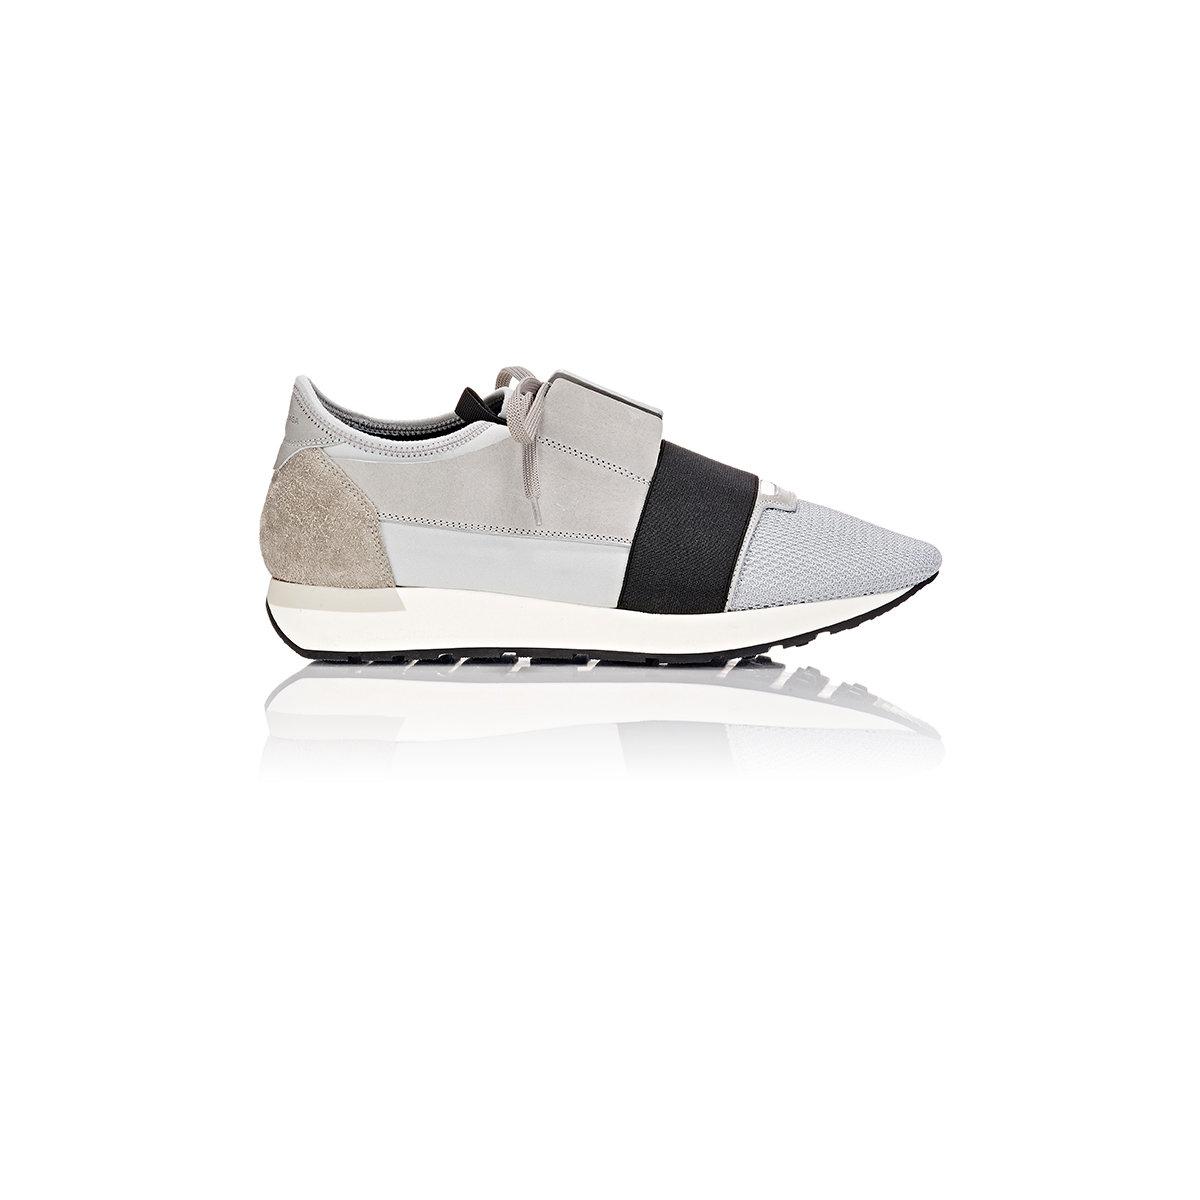 522ef3f6256d Lyst - Balenciaga Men s race Runner Sneakers in Gray for Men